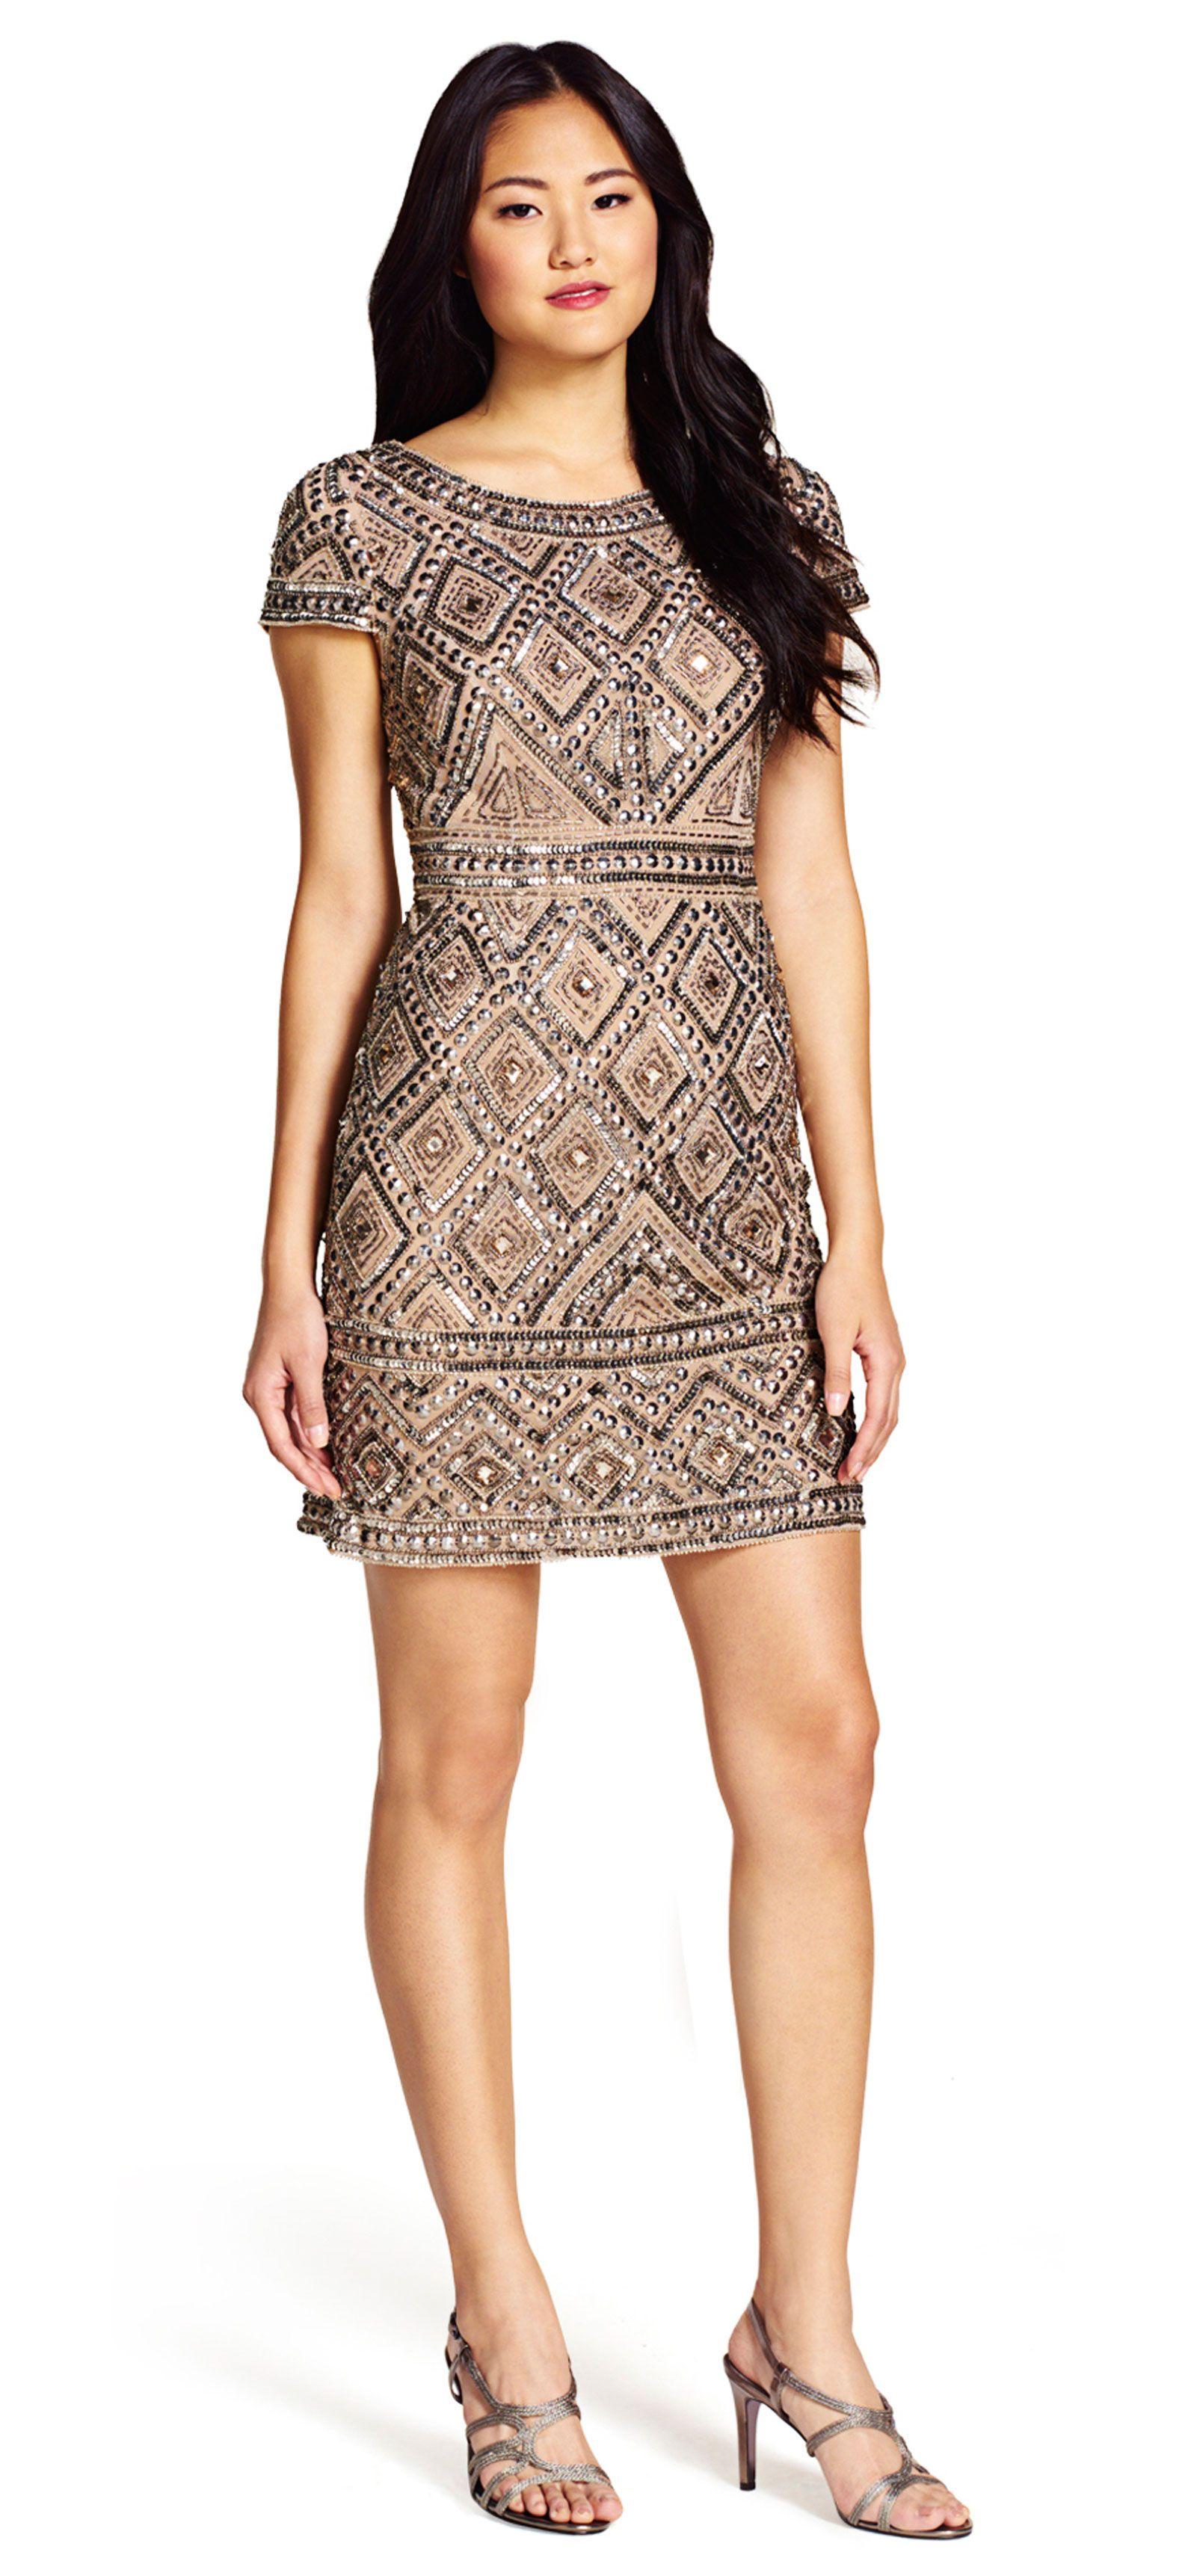 Cap Sleeve Beaded Cocktail Dress | #baziltonwedding2016 | Pinterest ...